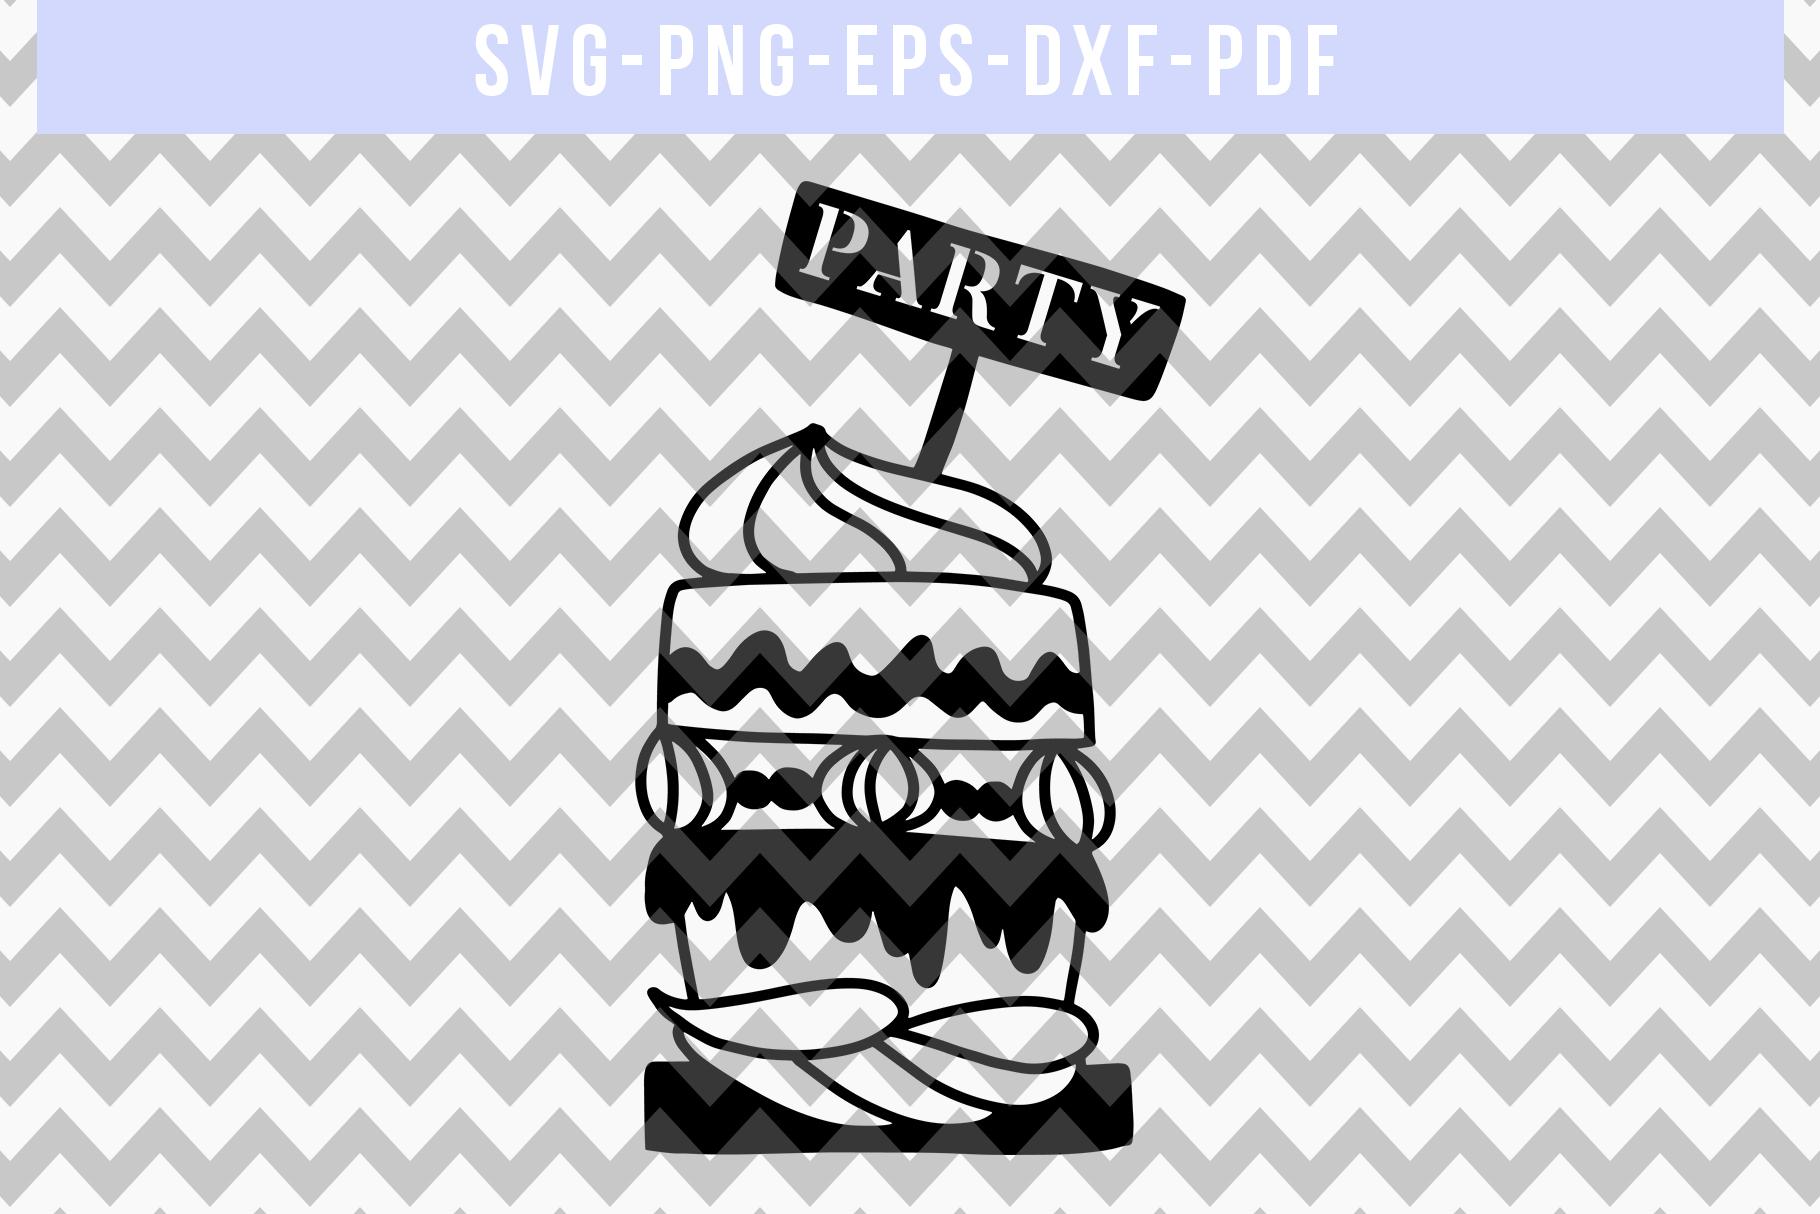 Cake Papercut Template, Birthday Party Invitation SVG, PDF example image 4